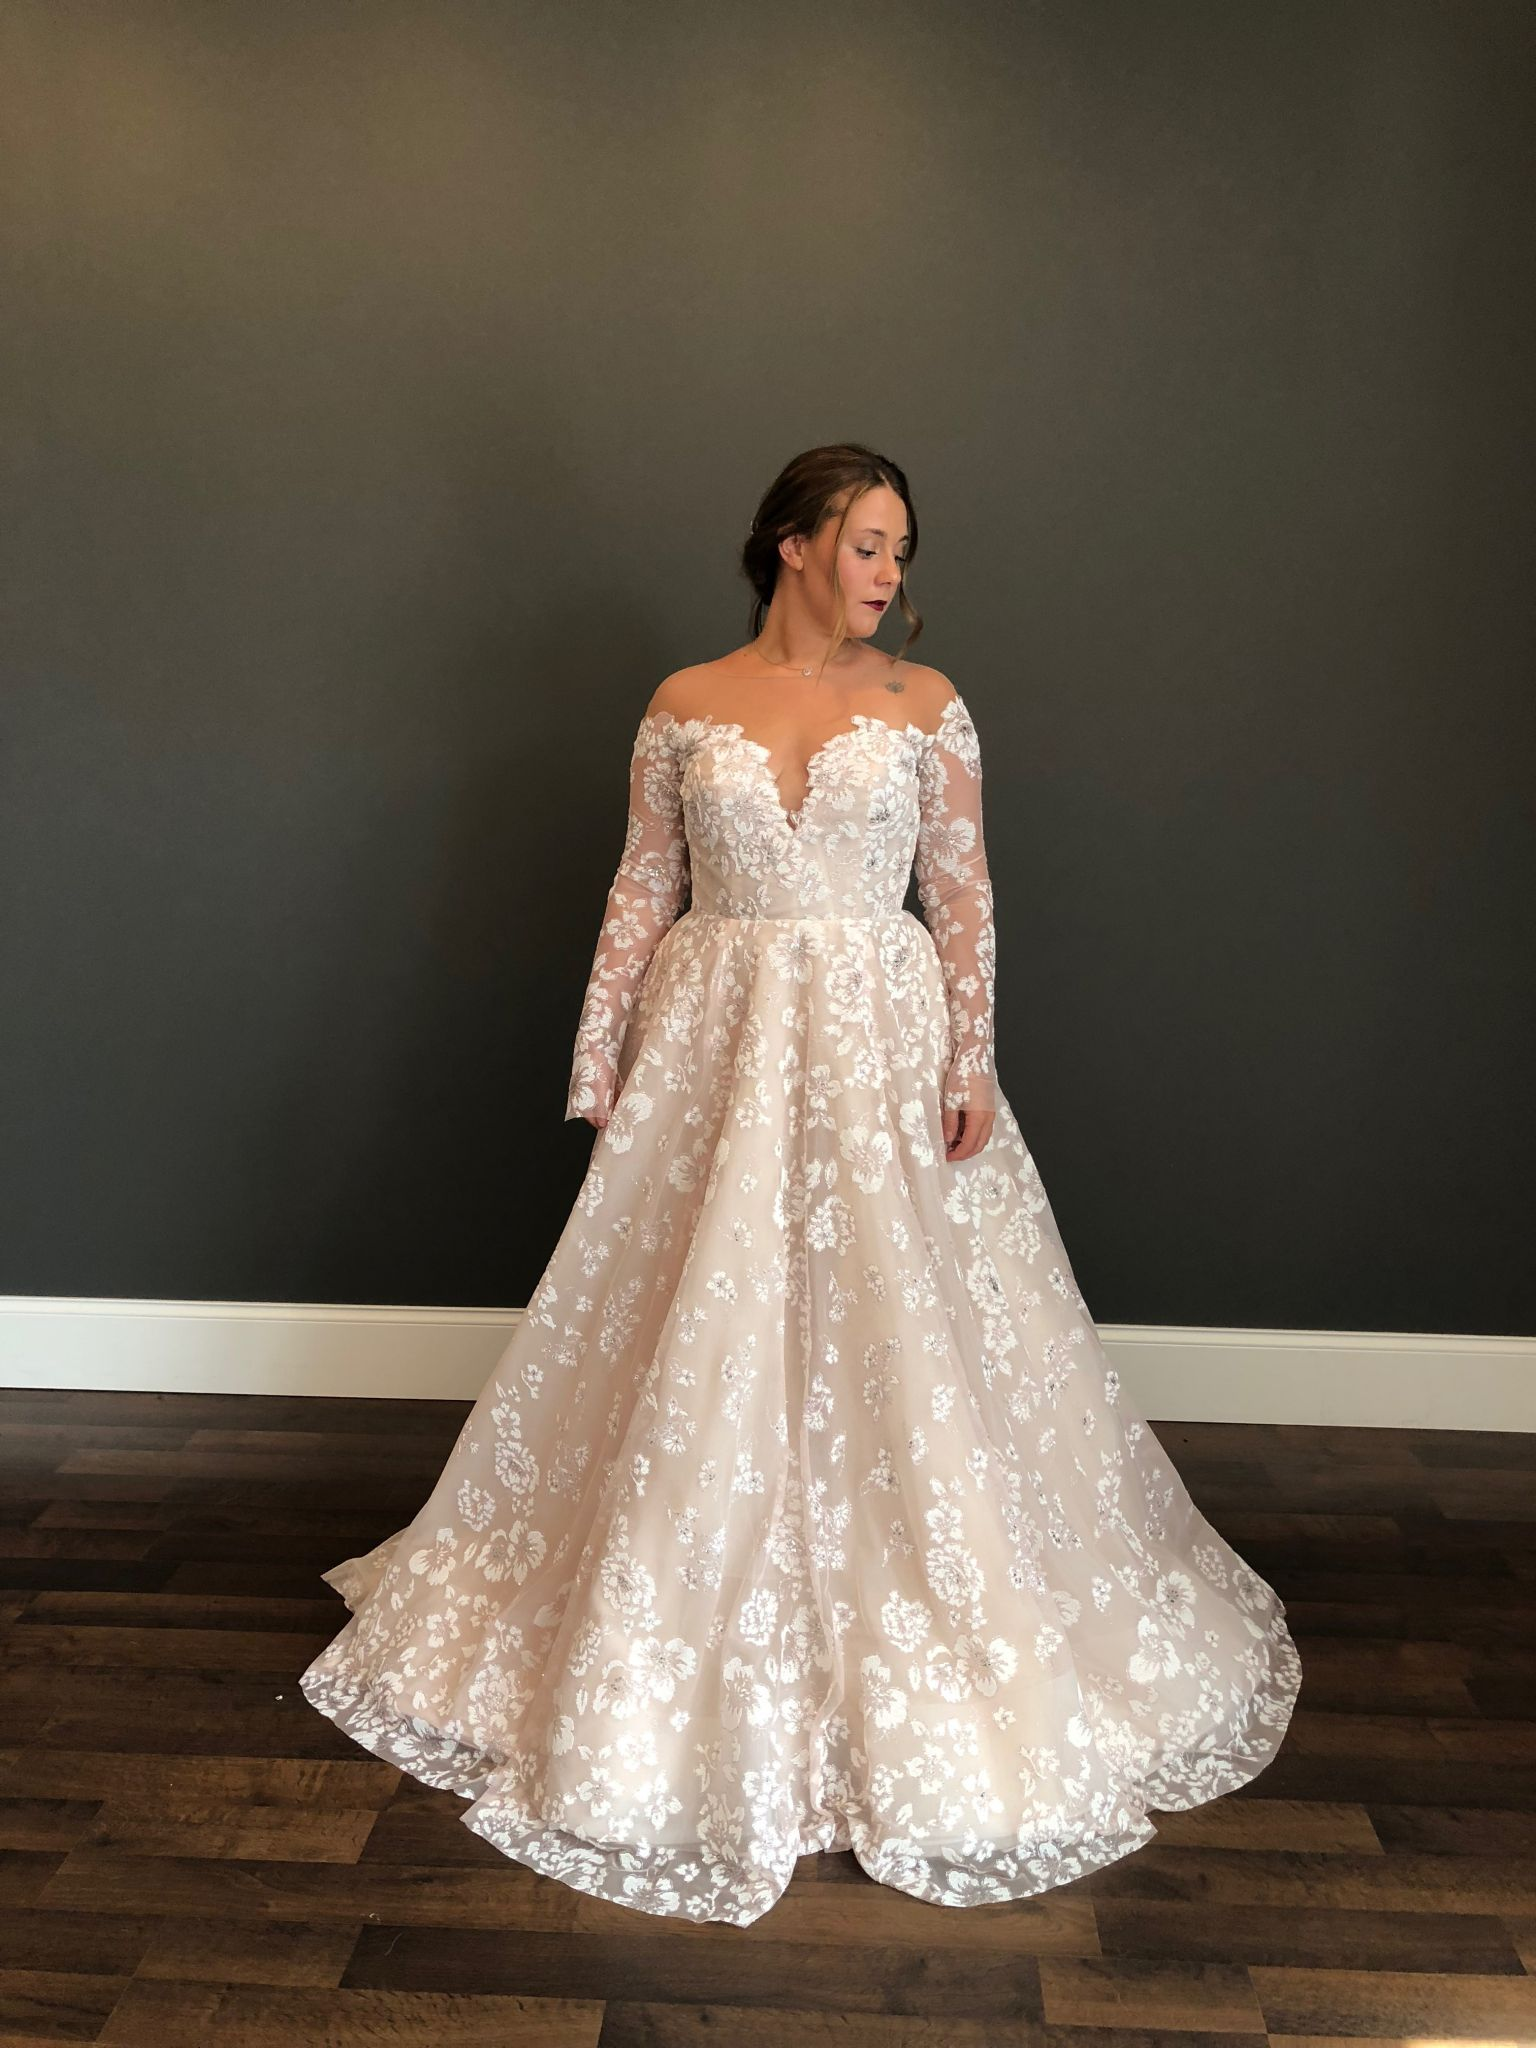 Hayley Paige Stevie 1 510 Size 12 New Un Altered Wedding Dresses Wedding Dress Long Sleeve Plus Wedding Dresses Plus Size Wedding Dresses With Sleeves [ 2048 x 1536 Pixel ]